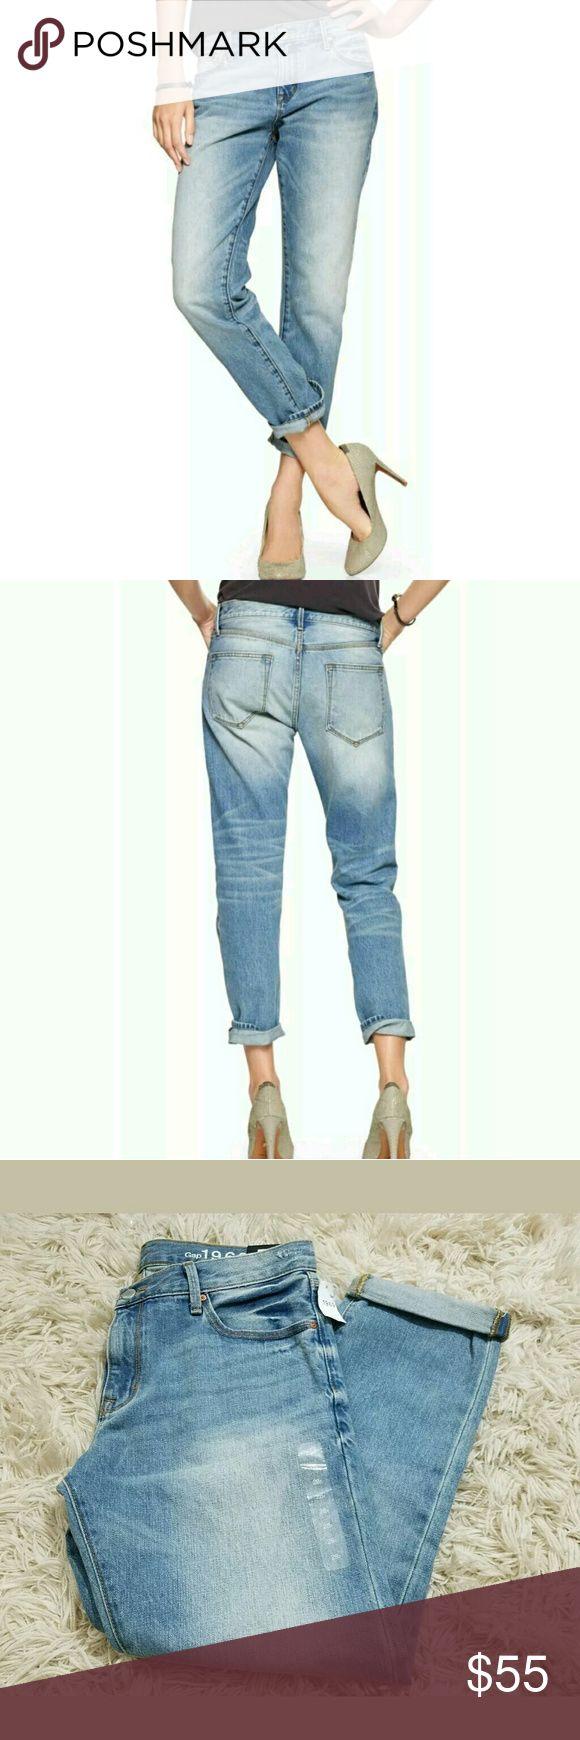 GAP Sexy Boyfriend Low Rise Light Blue Jeans GAP Sexy Boyfriend Low Rise Light Blue Jeans Size 28 $69.95  New jeans. 35 inch waist. 9.5 inch rise. 40 inch hips. 25.5 inch inseam with cuff.     LB GAP Jeans Boyfriend